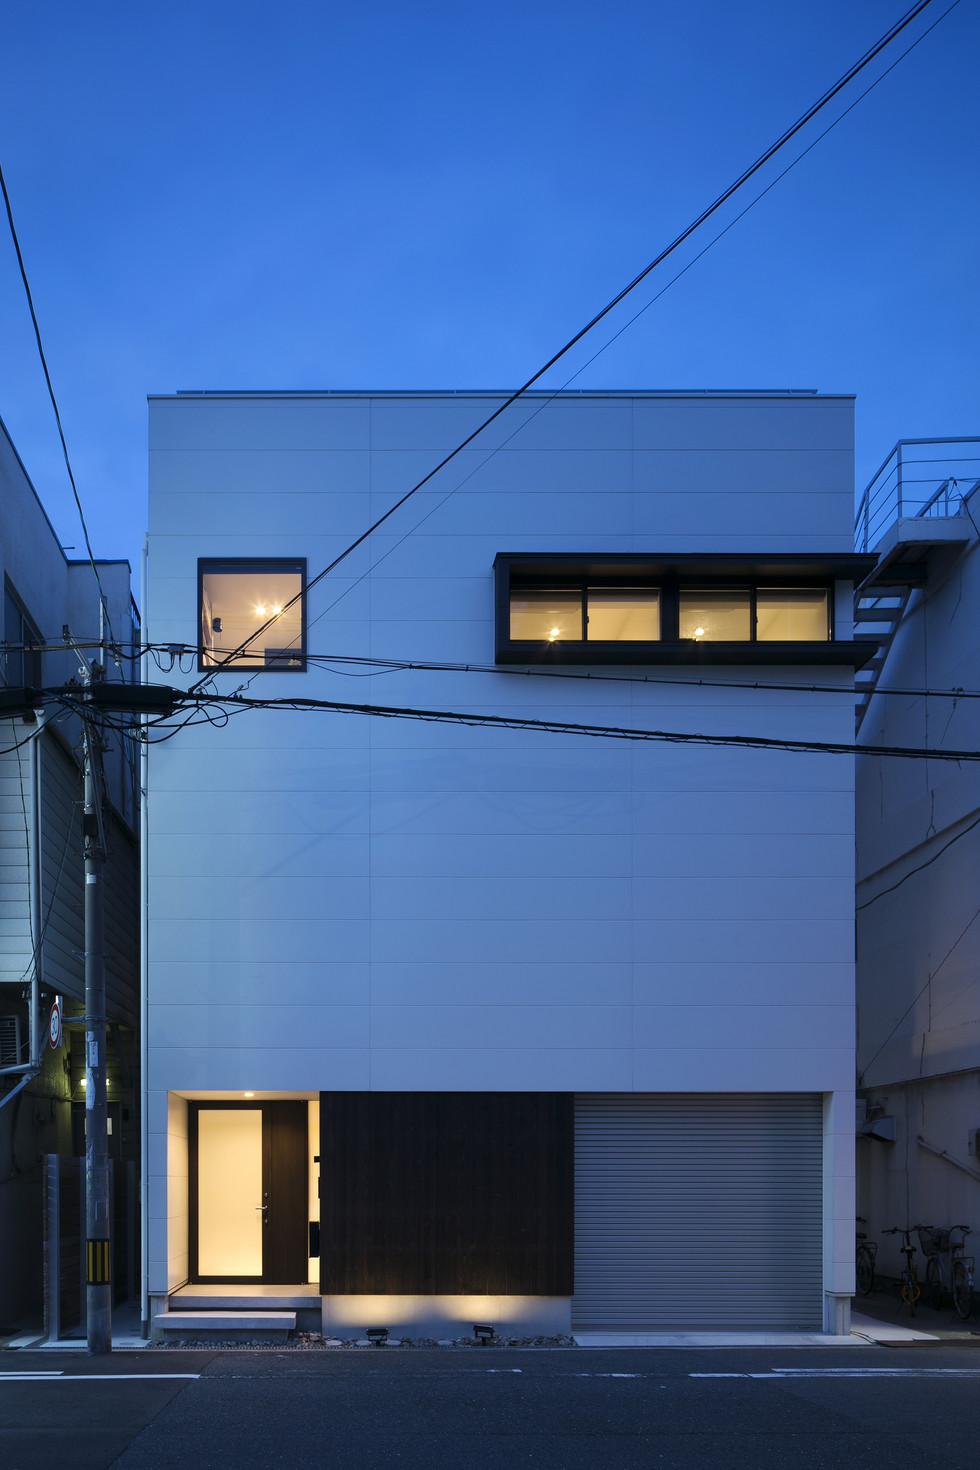 custom-built-house-osaka-city_2400_13.jp